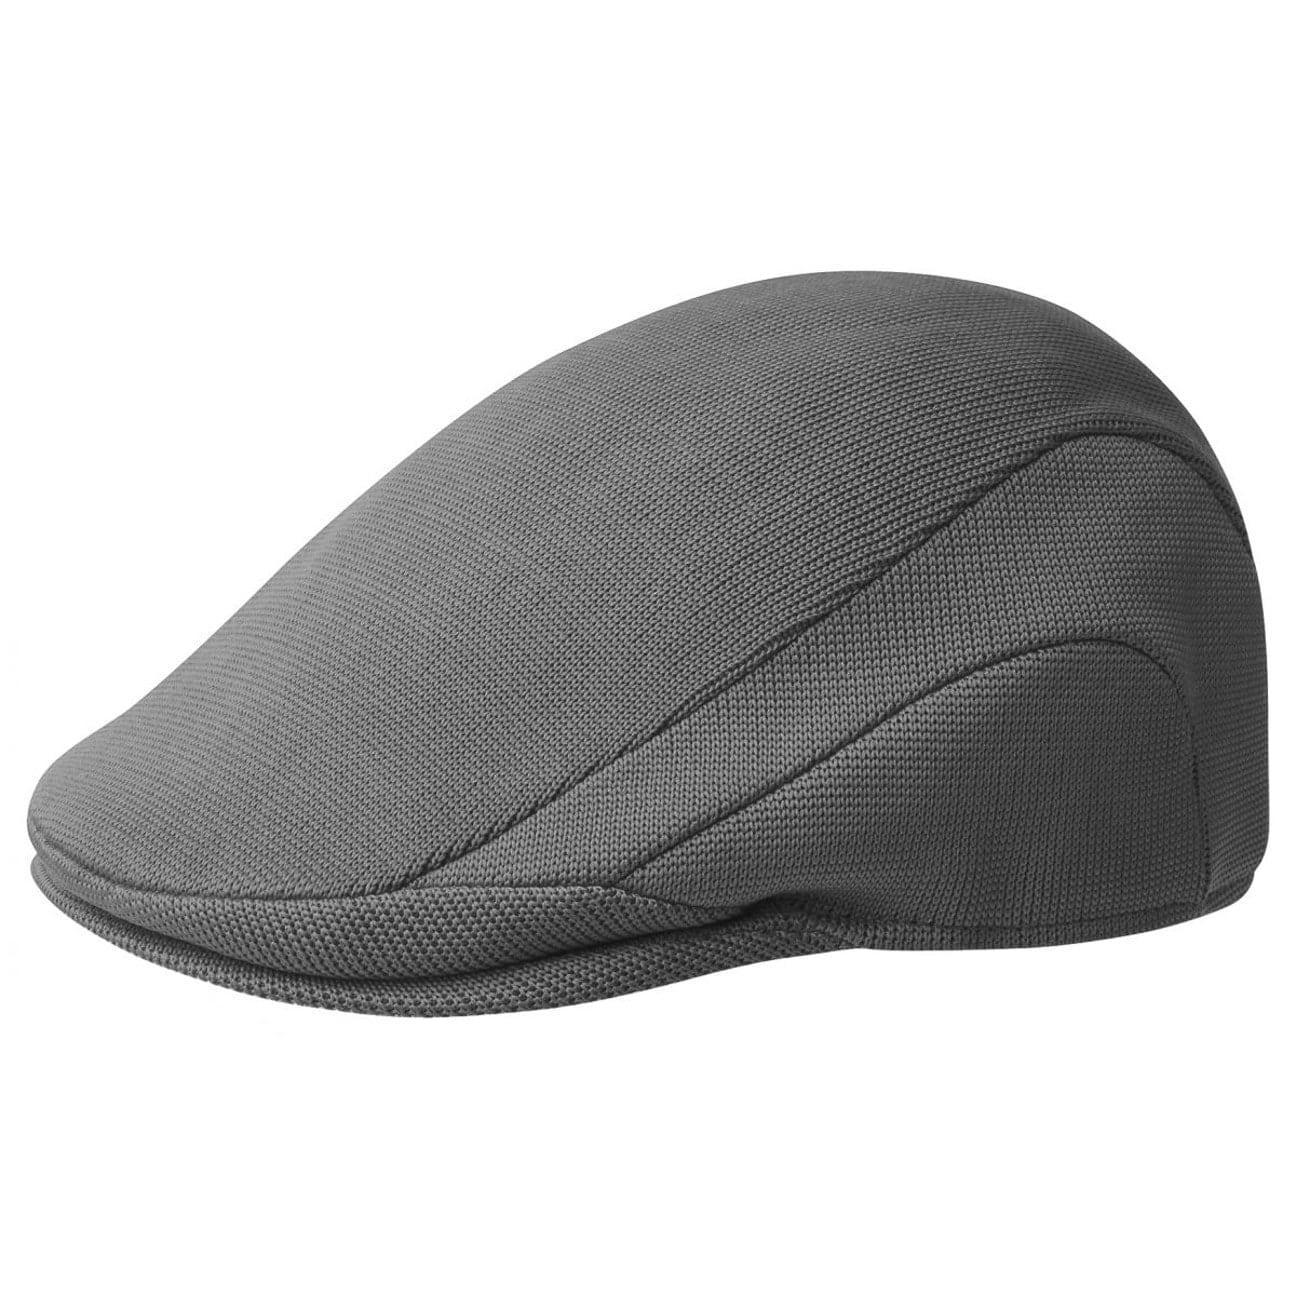 Gorra Plana Kangol Tropic 507 - Gorras - sombreroshop.es f85c7f92a61